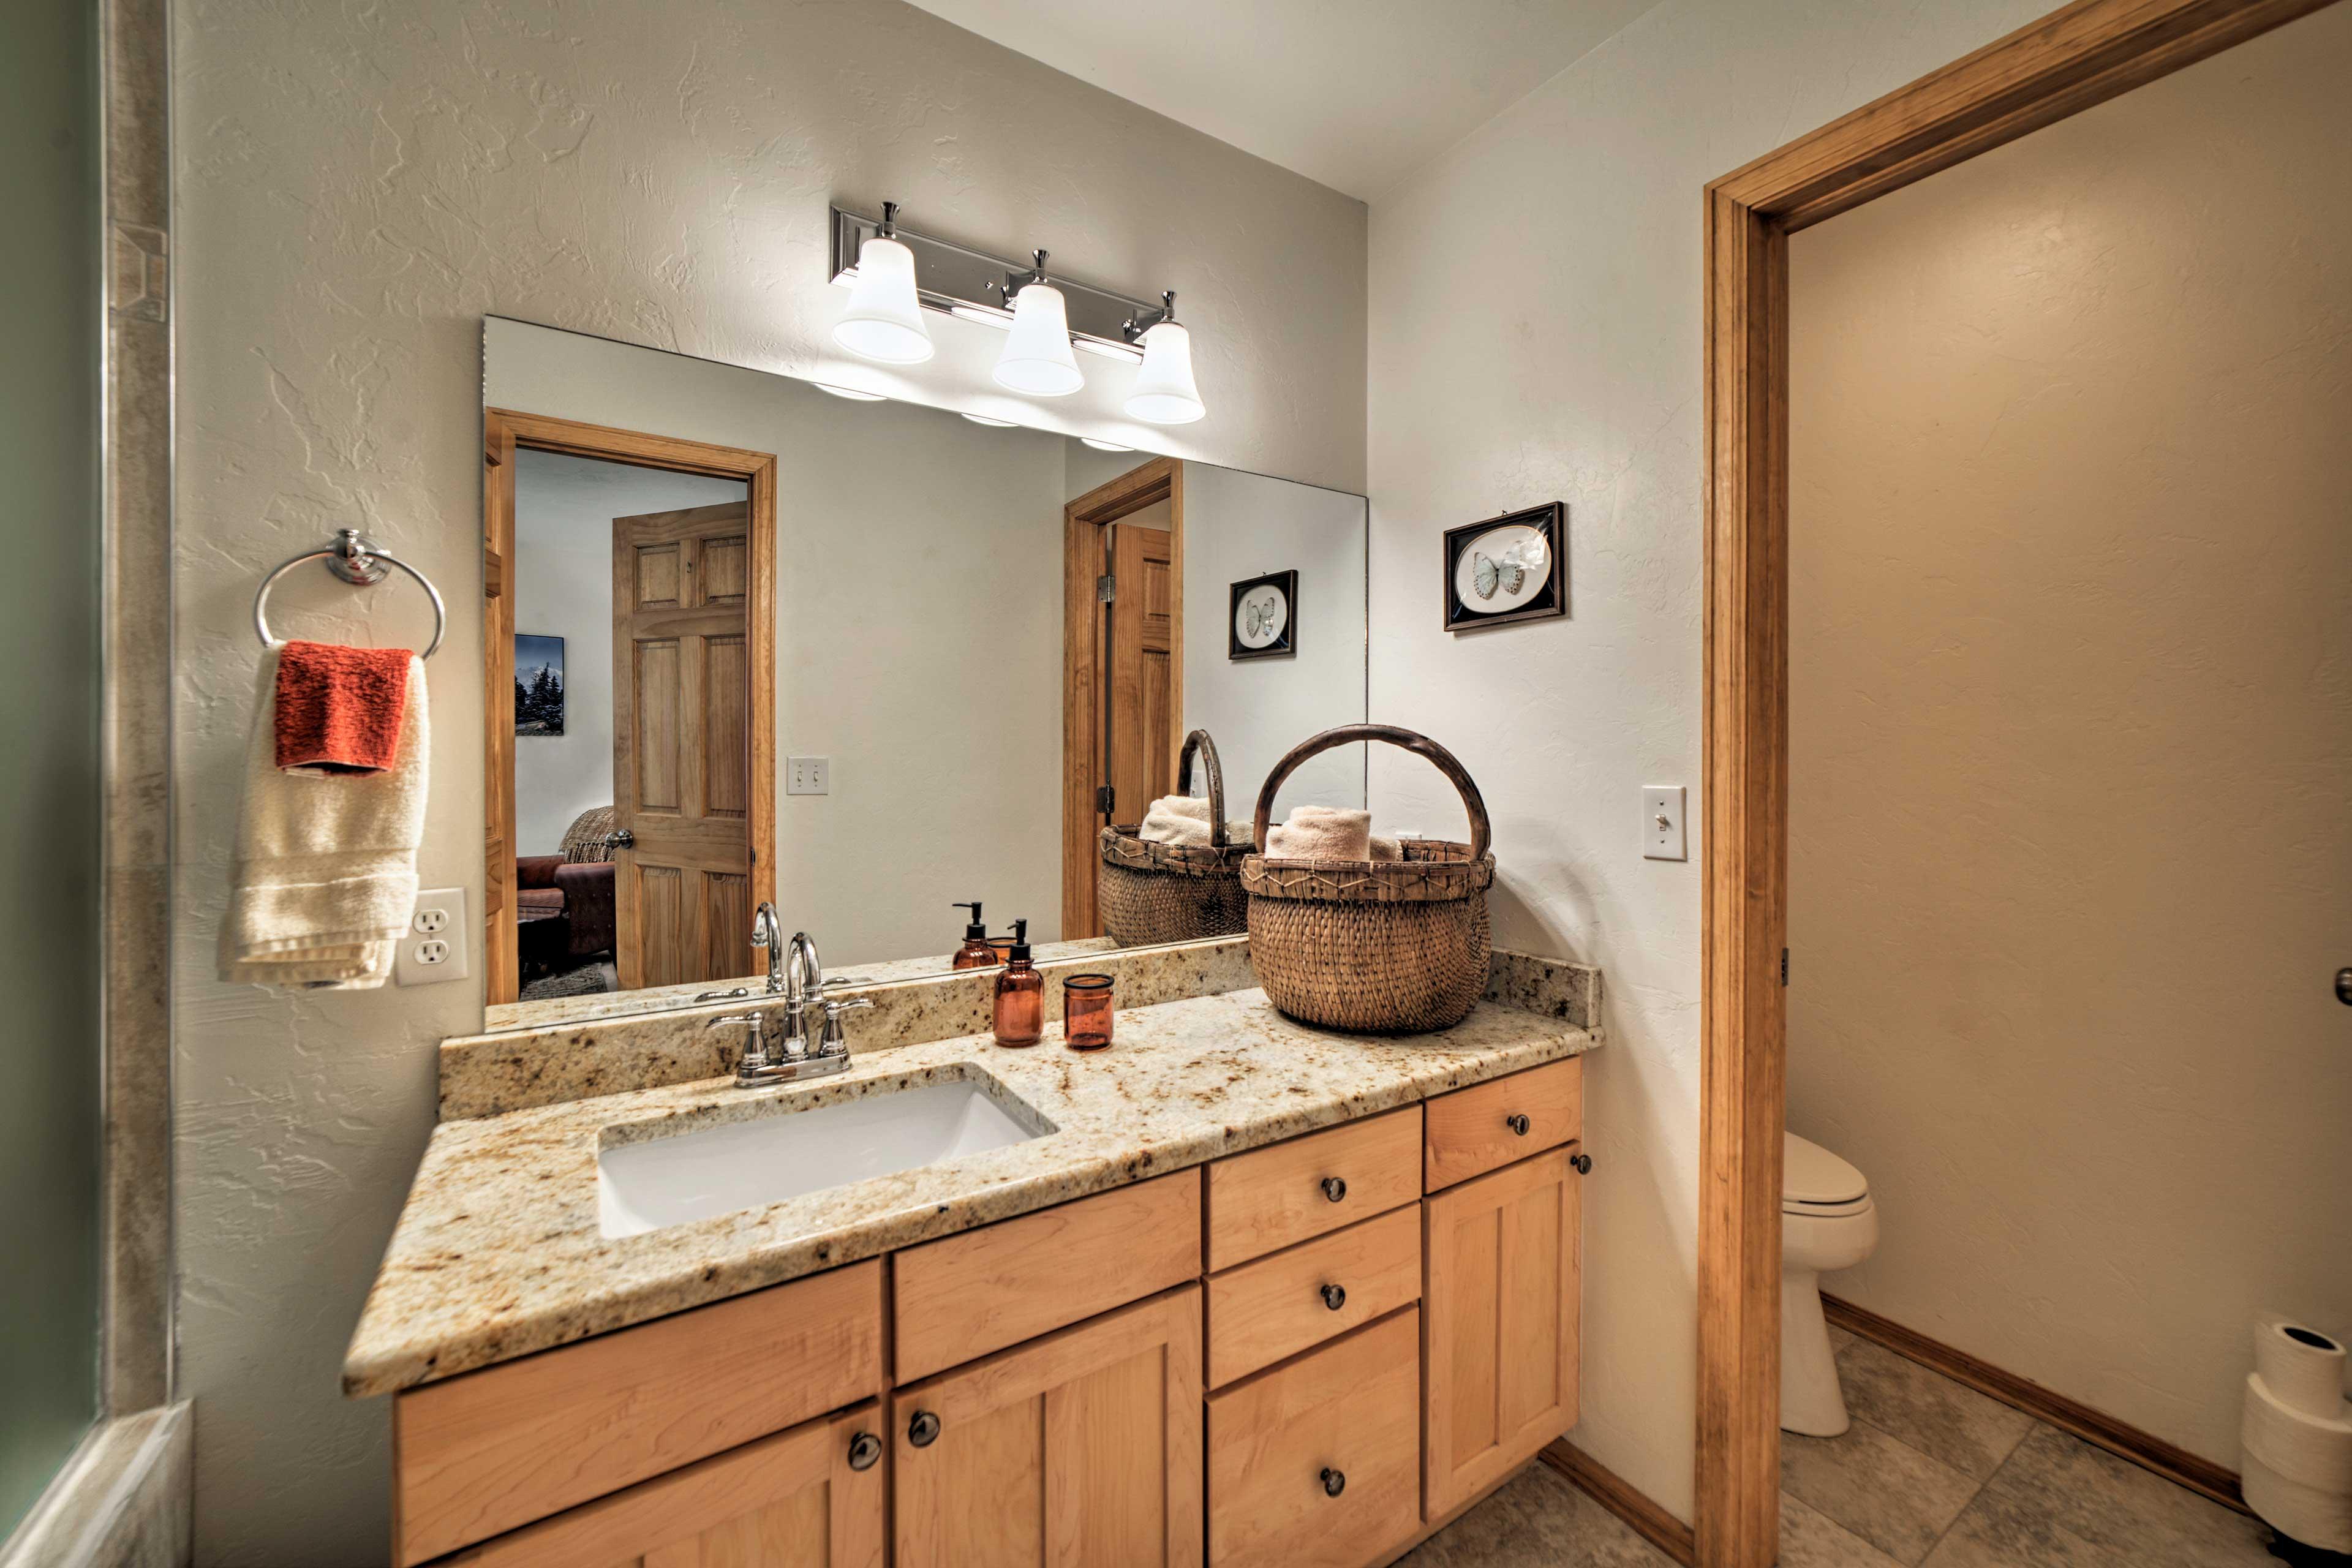 The en-suite bathroom adds extra privacy.